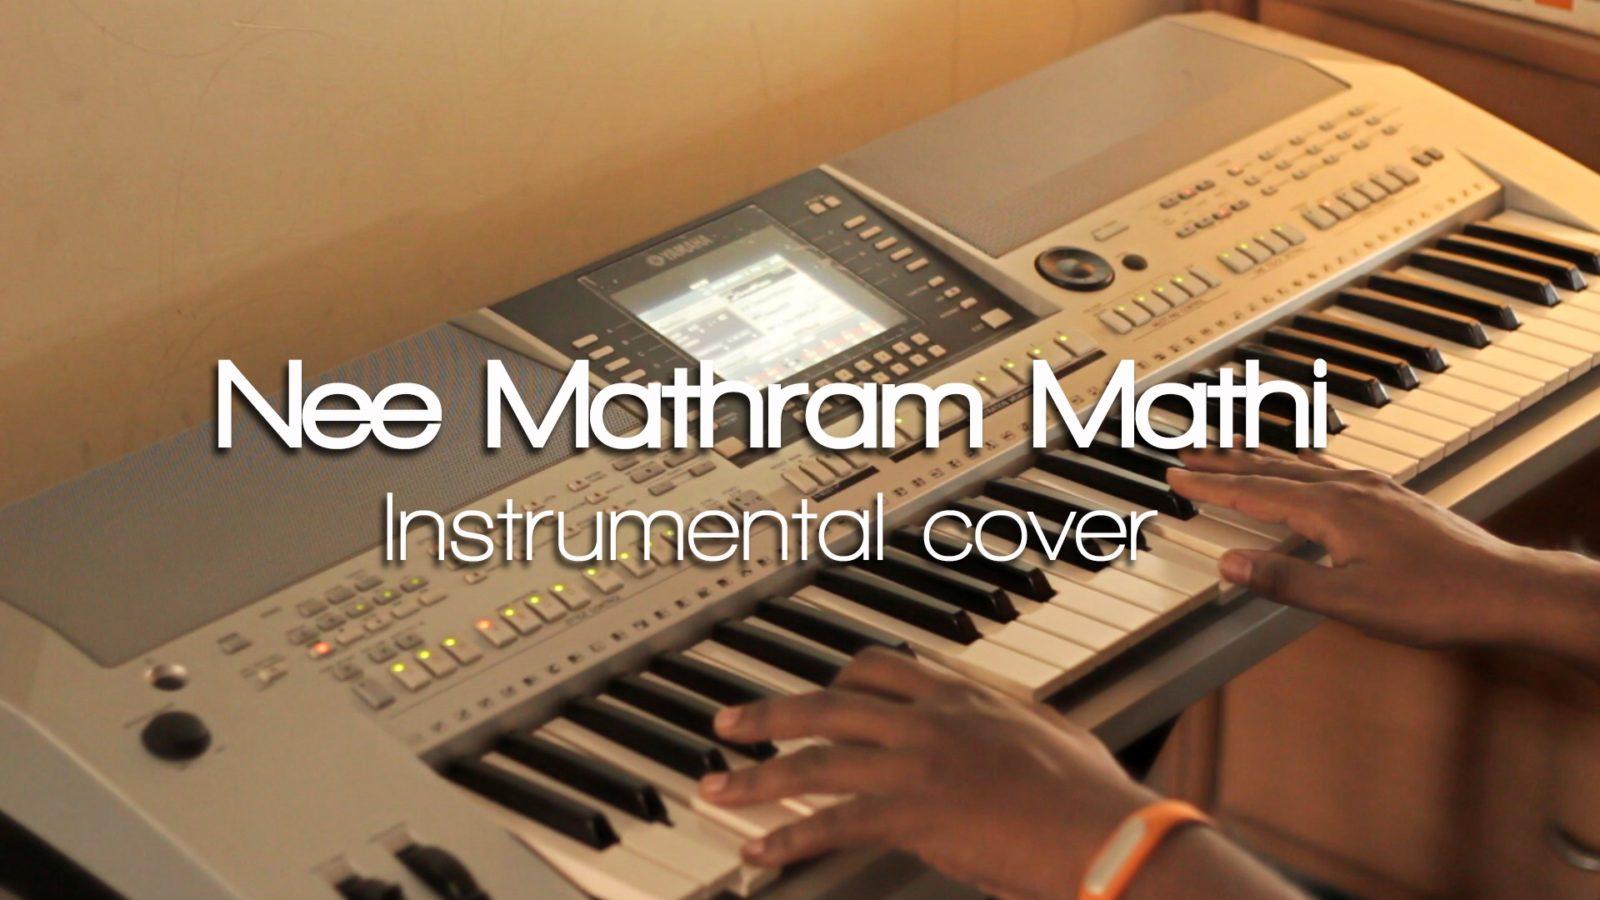 Nee Mathram mathi